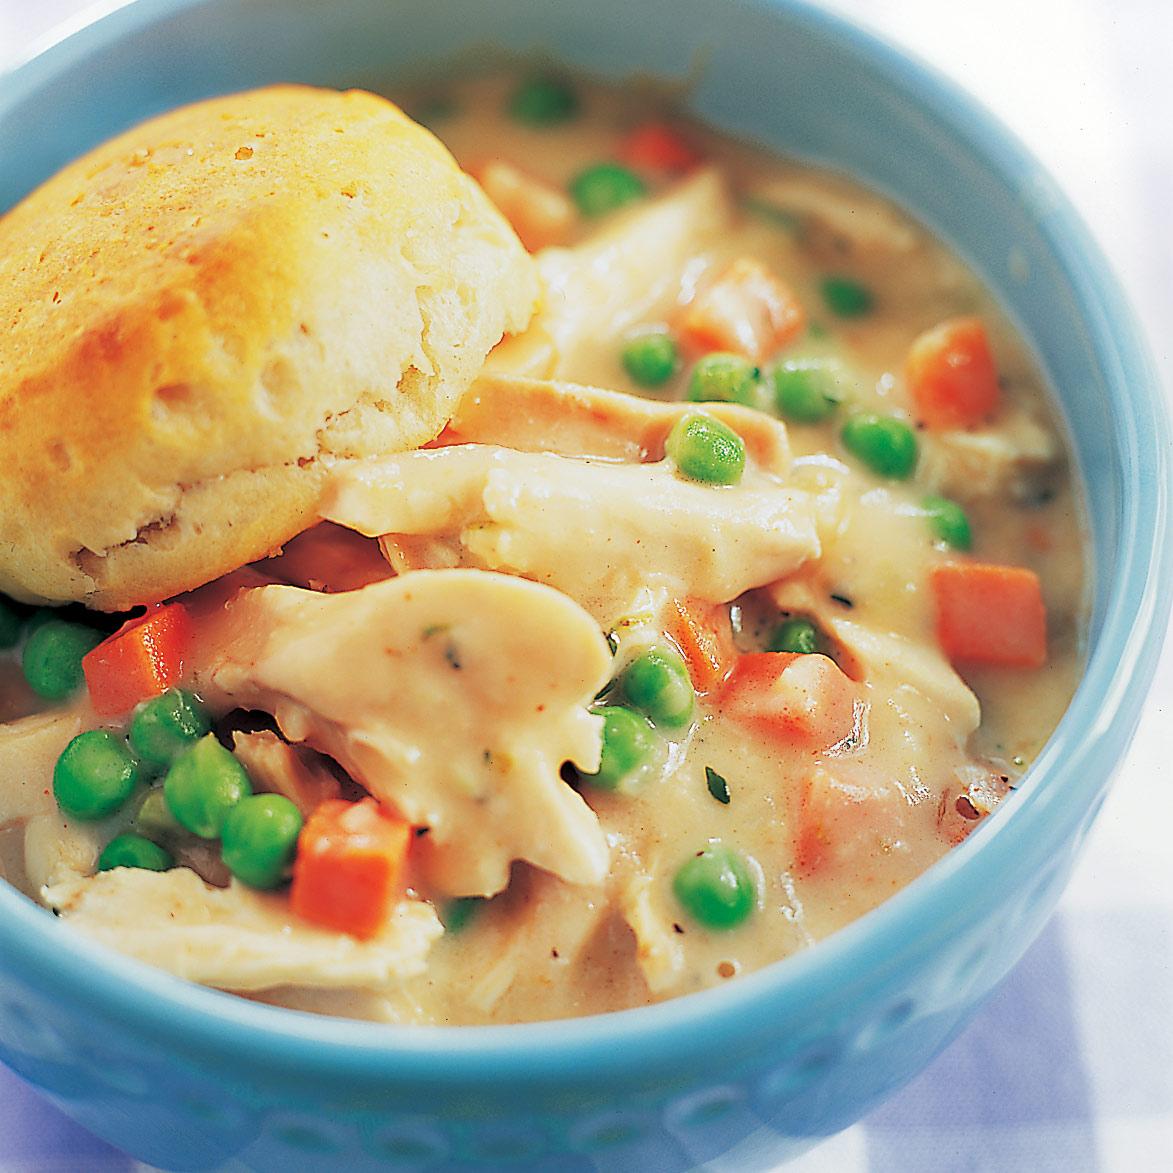 Slow Cooker Chicken Pot Pie Beverly Buonaugurio